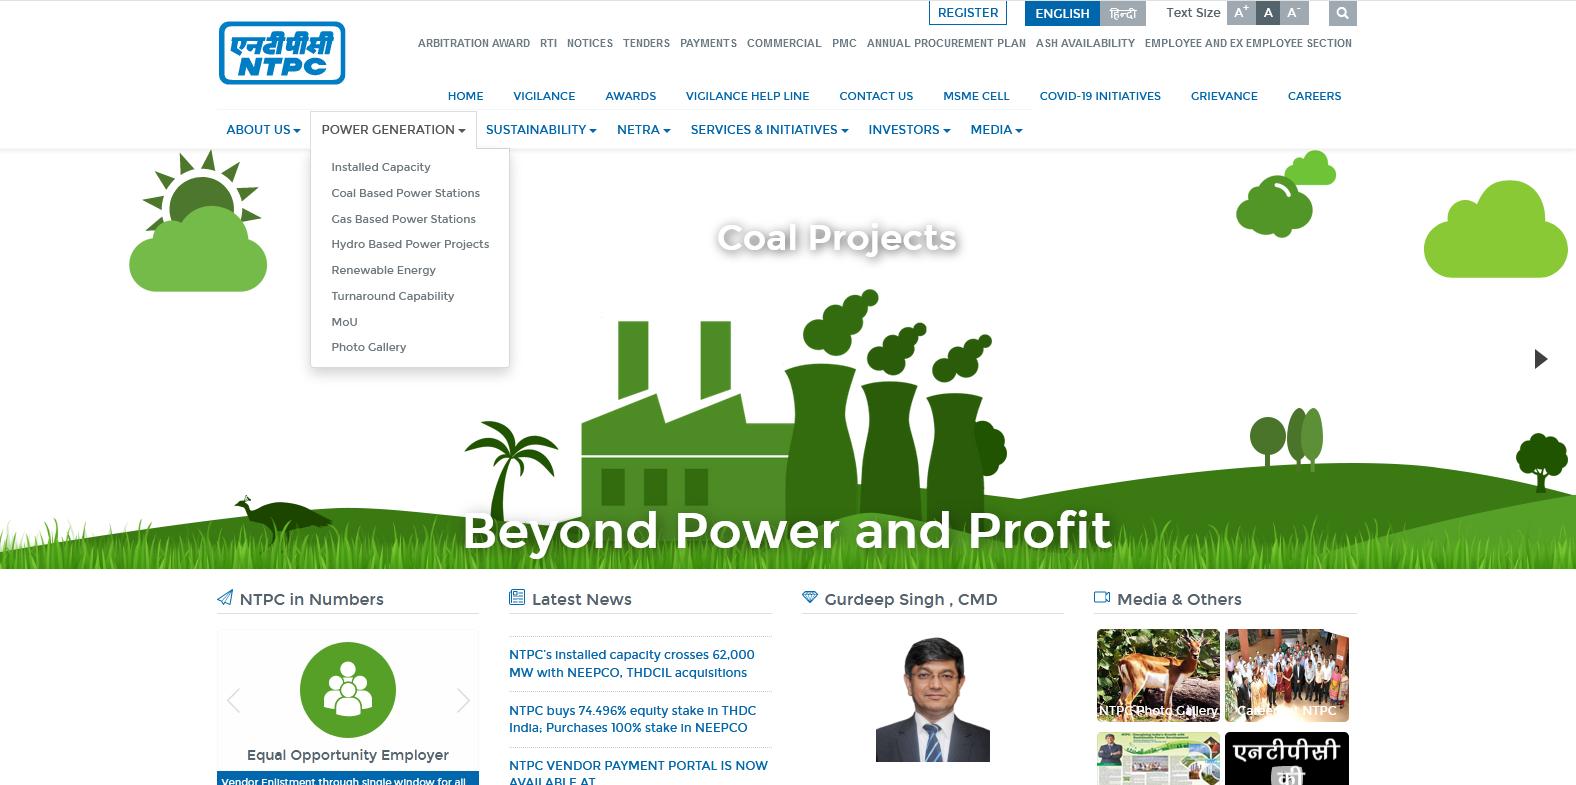 NTPC 2021 WWW.ONLINESTUDYPOINTS.COM